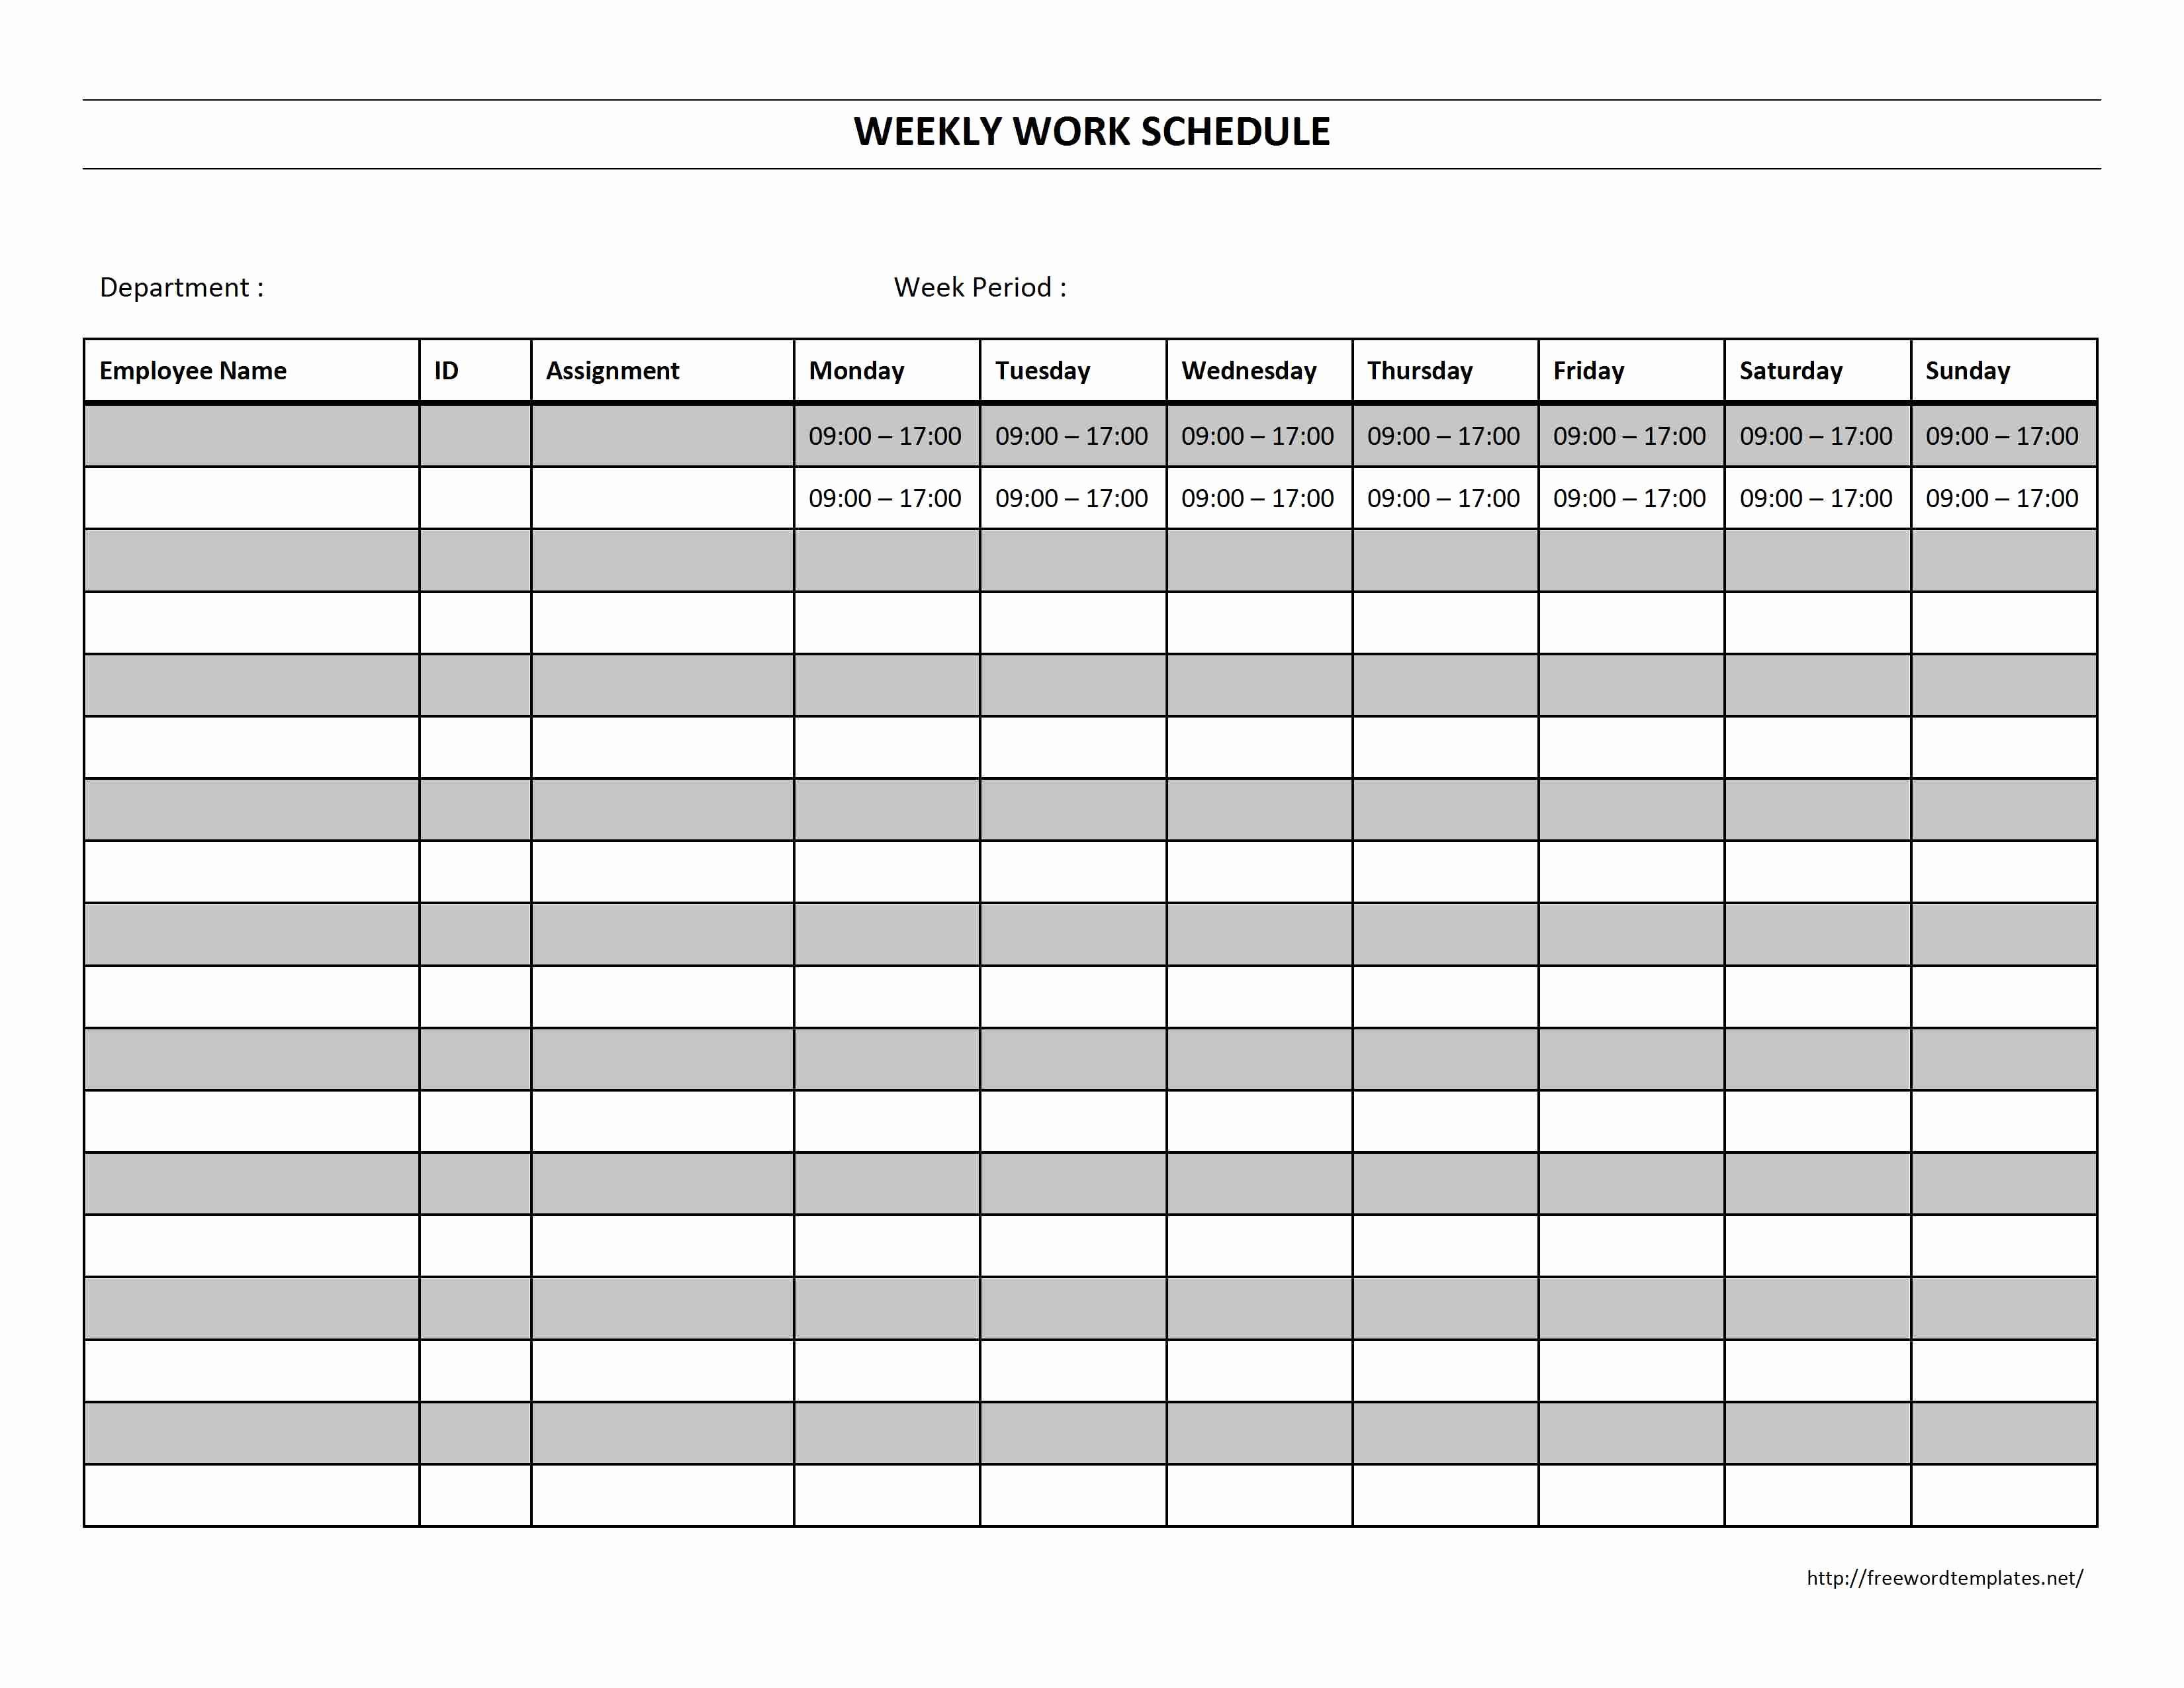 One Week Schedule Template Lovely Weekly Work Schedule